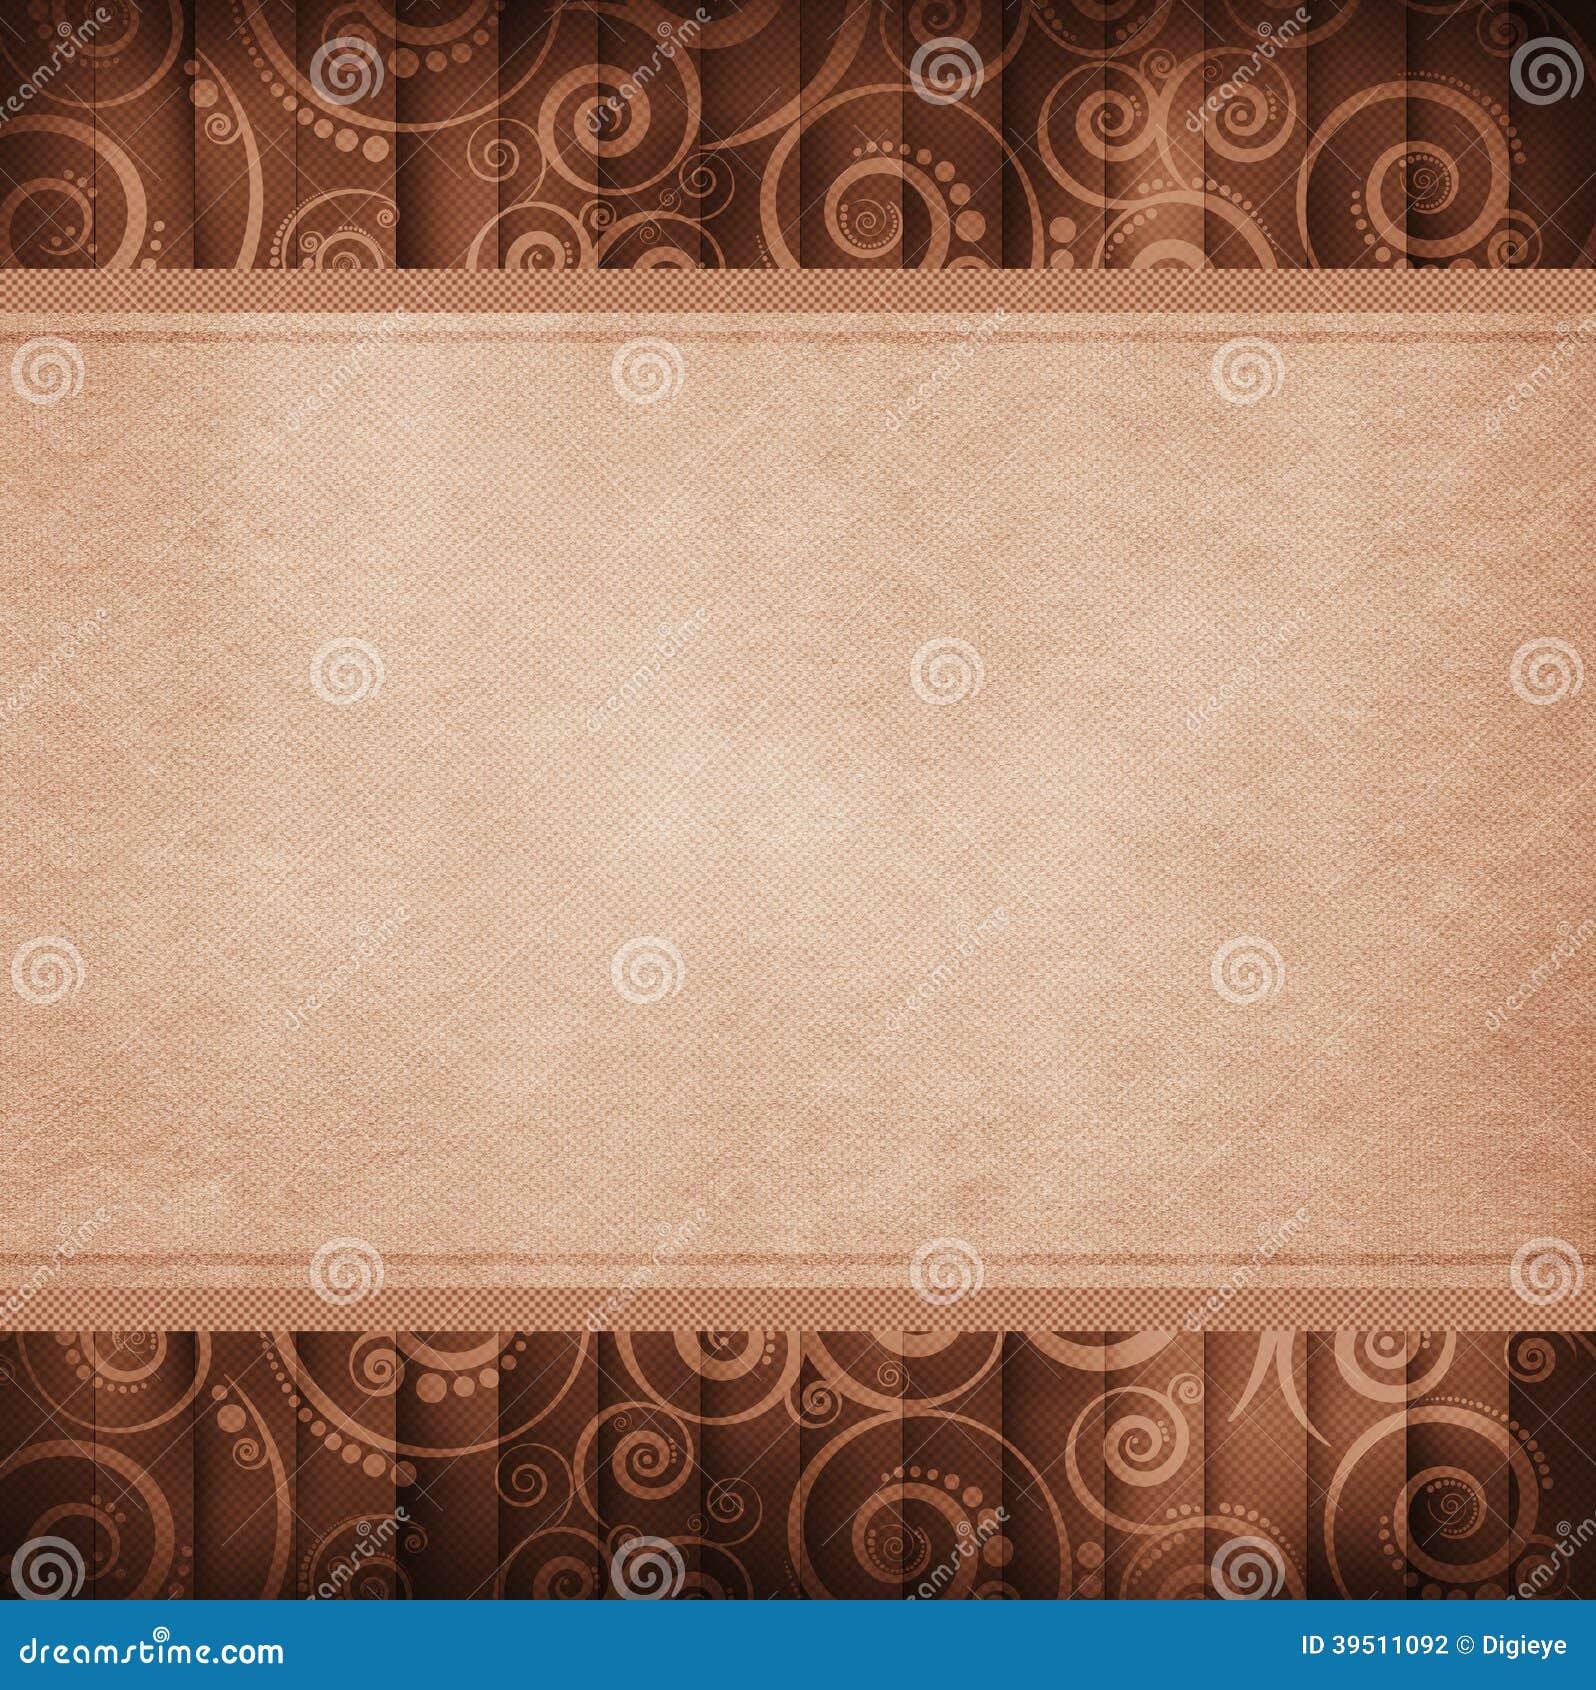 Grunge background template